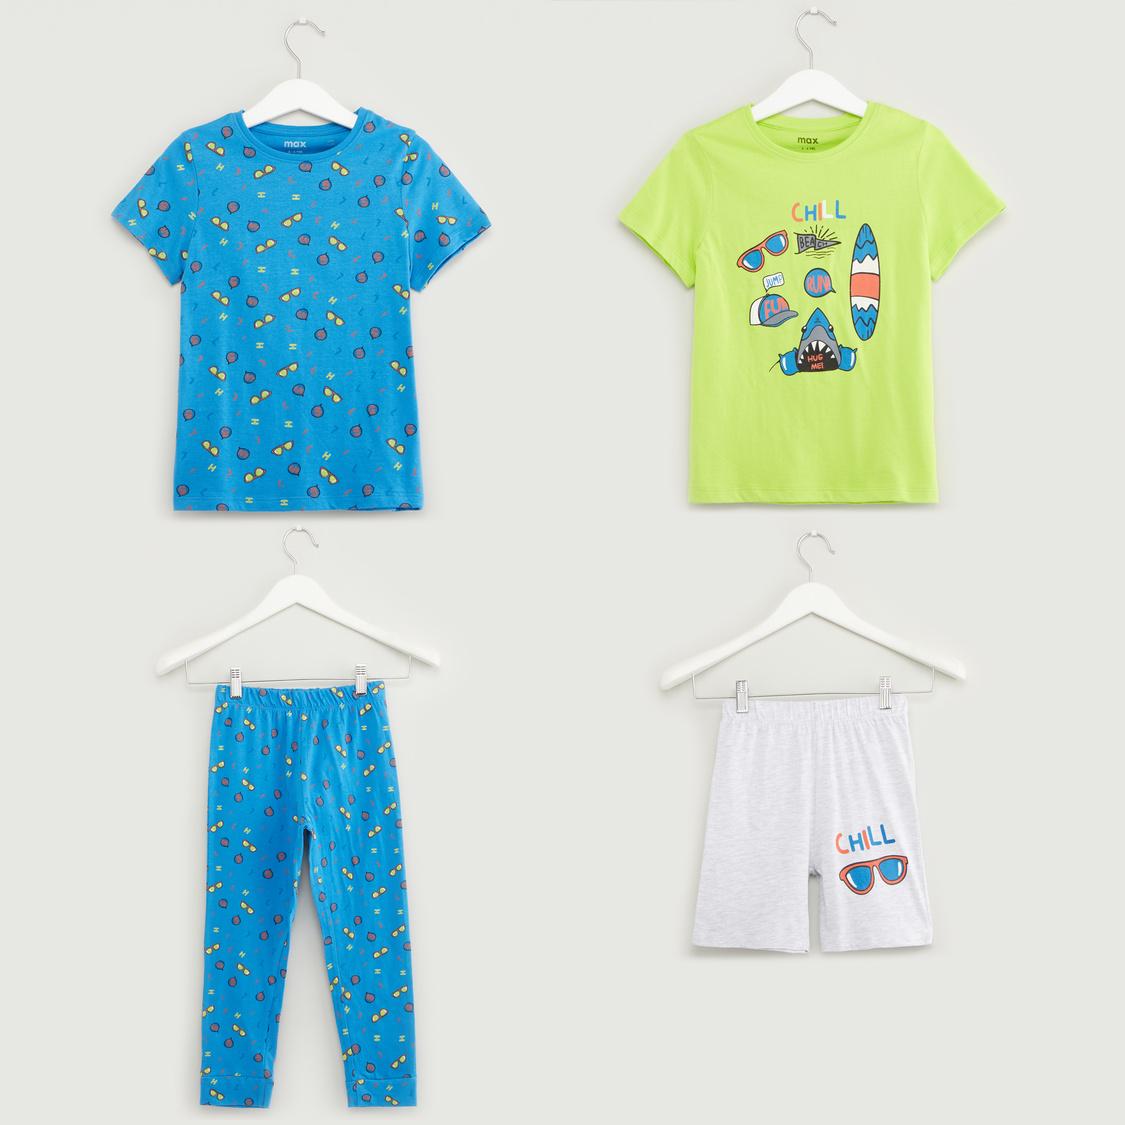 Printed 4-Piece Clothing Set